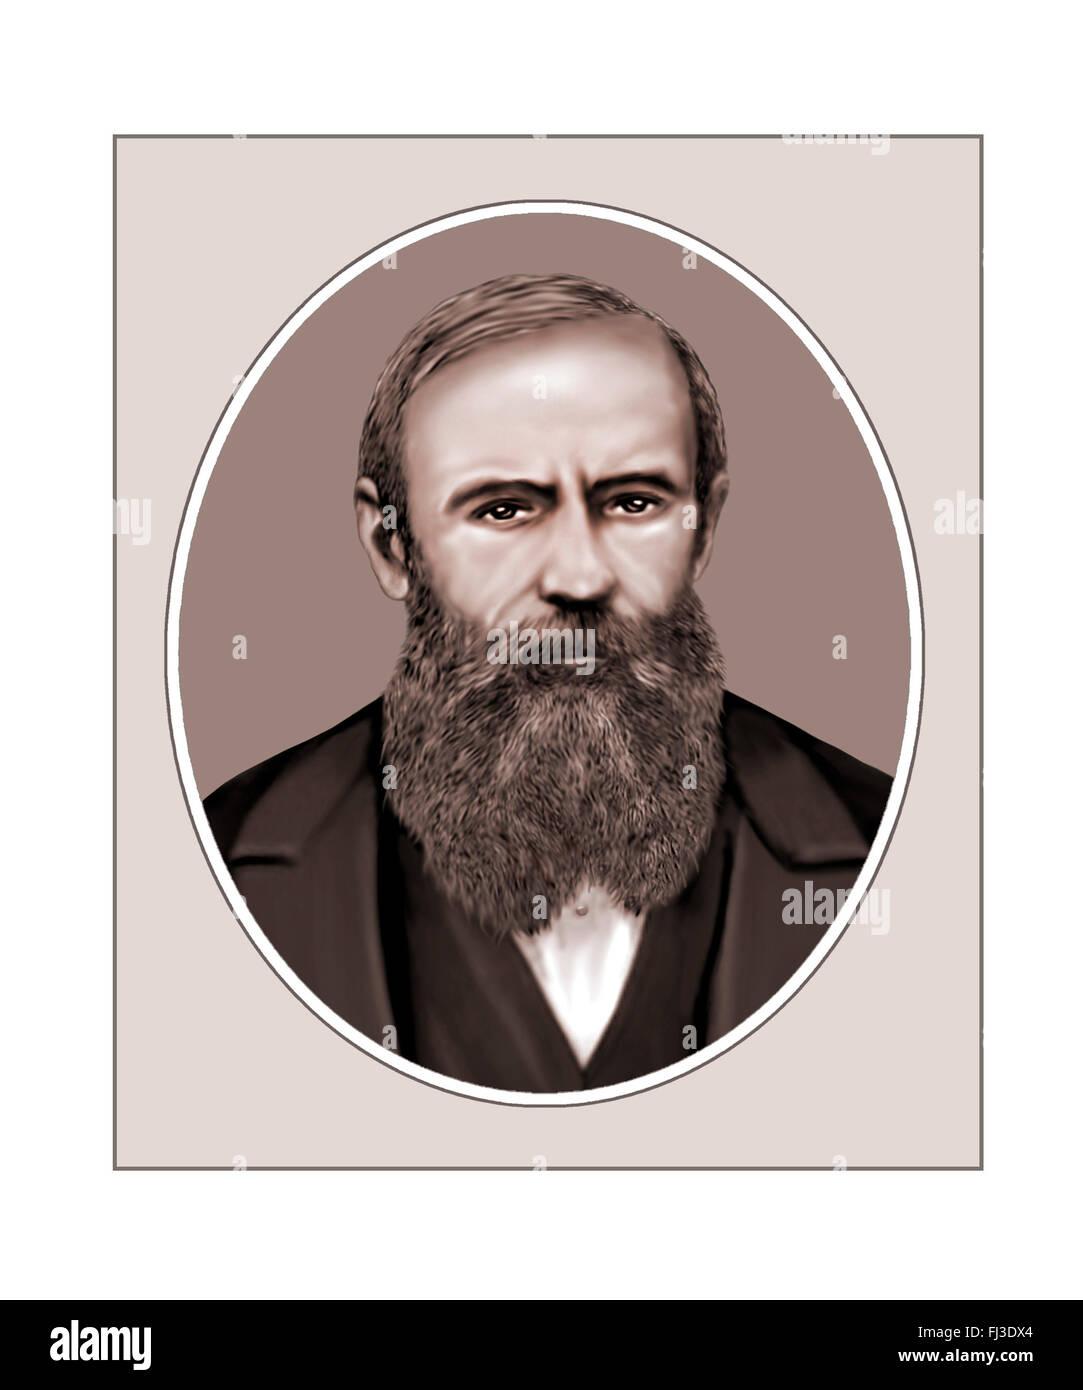 Fyodor Mikhailovich Dostoevsky, Novelist, Portrait - Stock Image